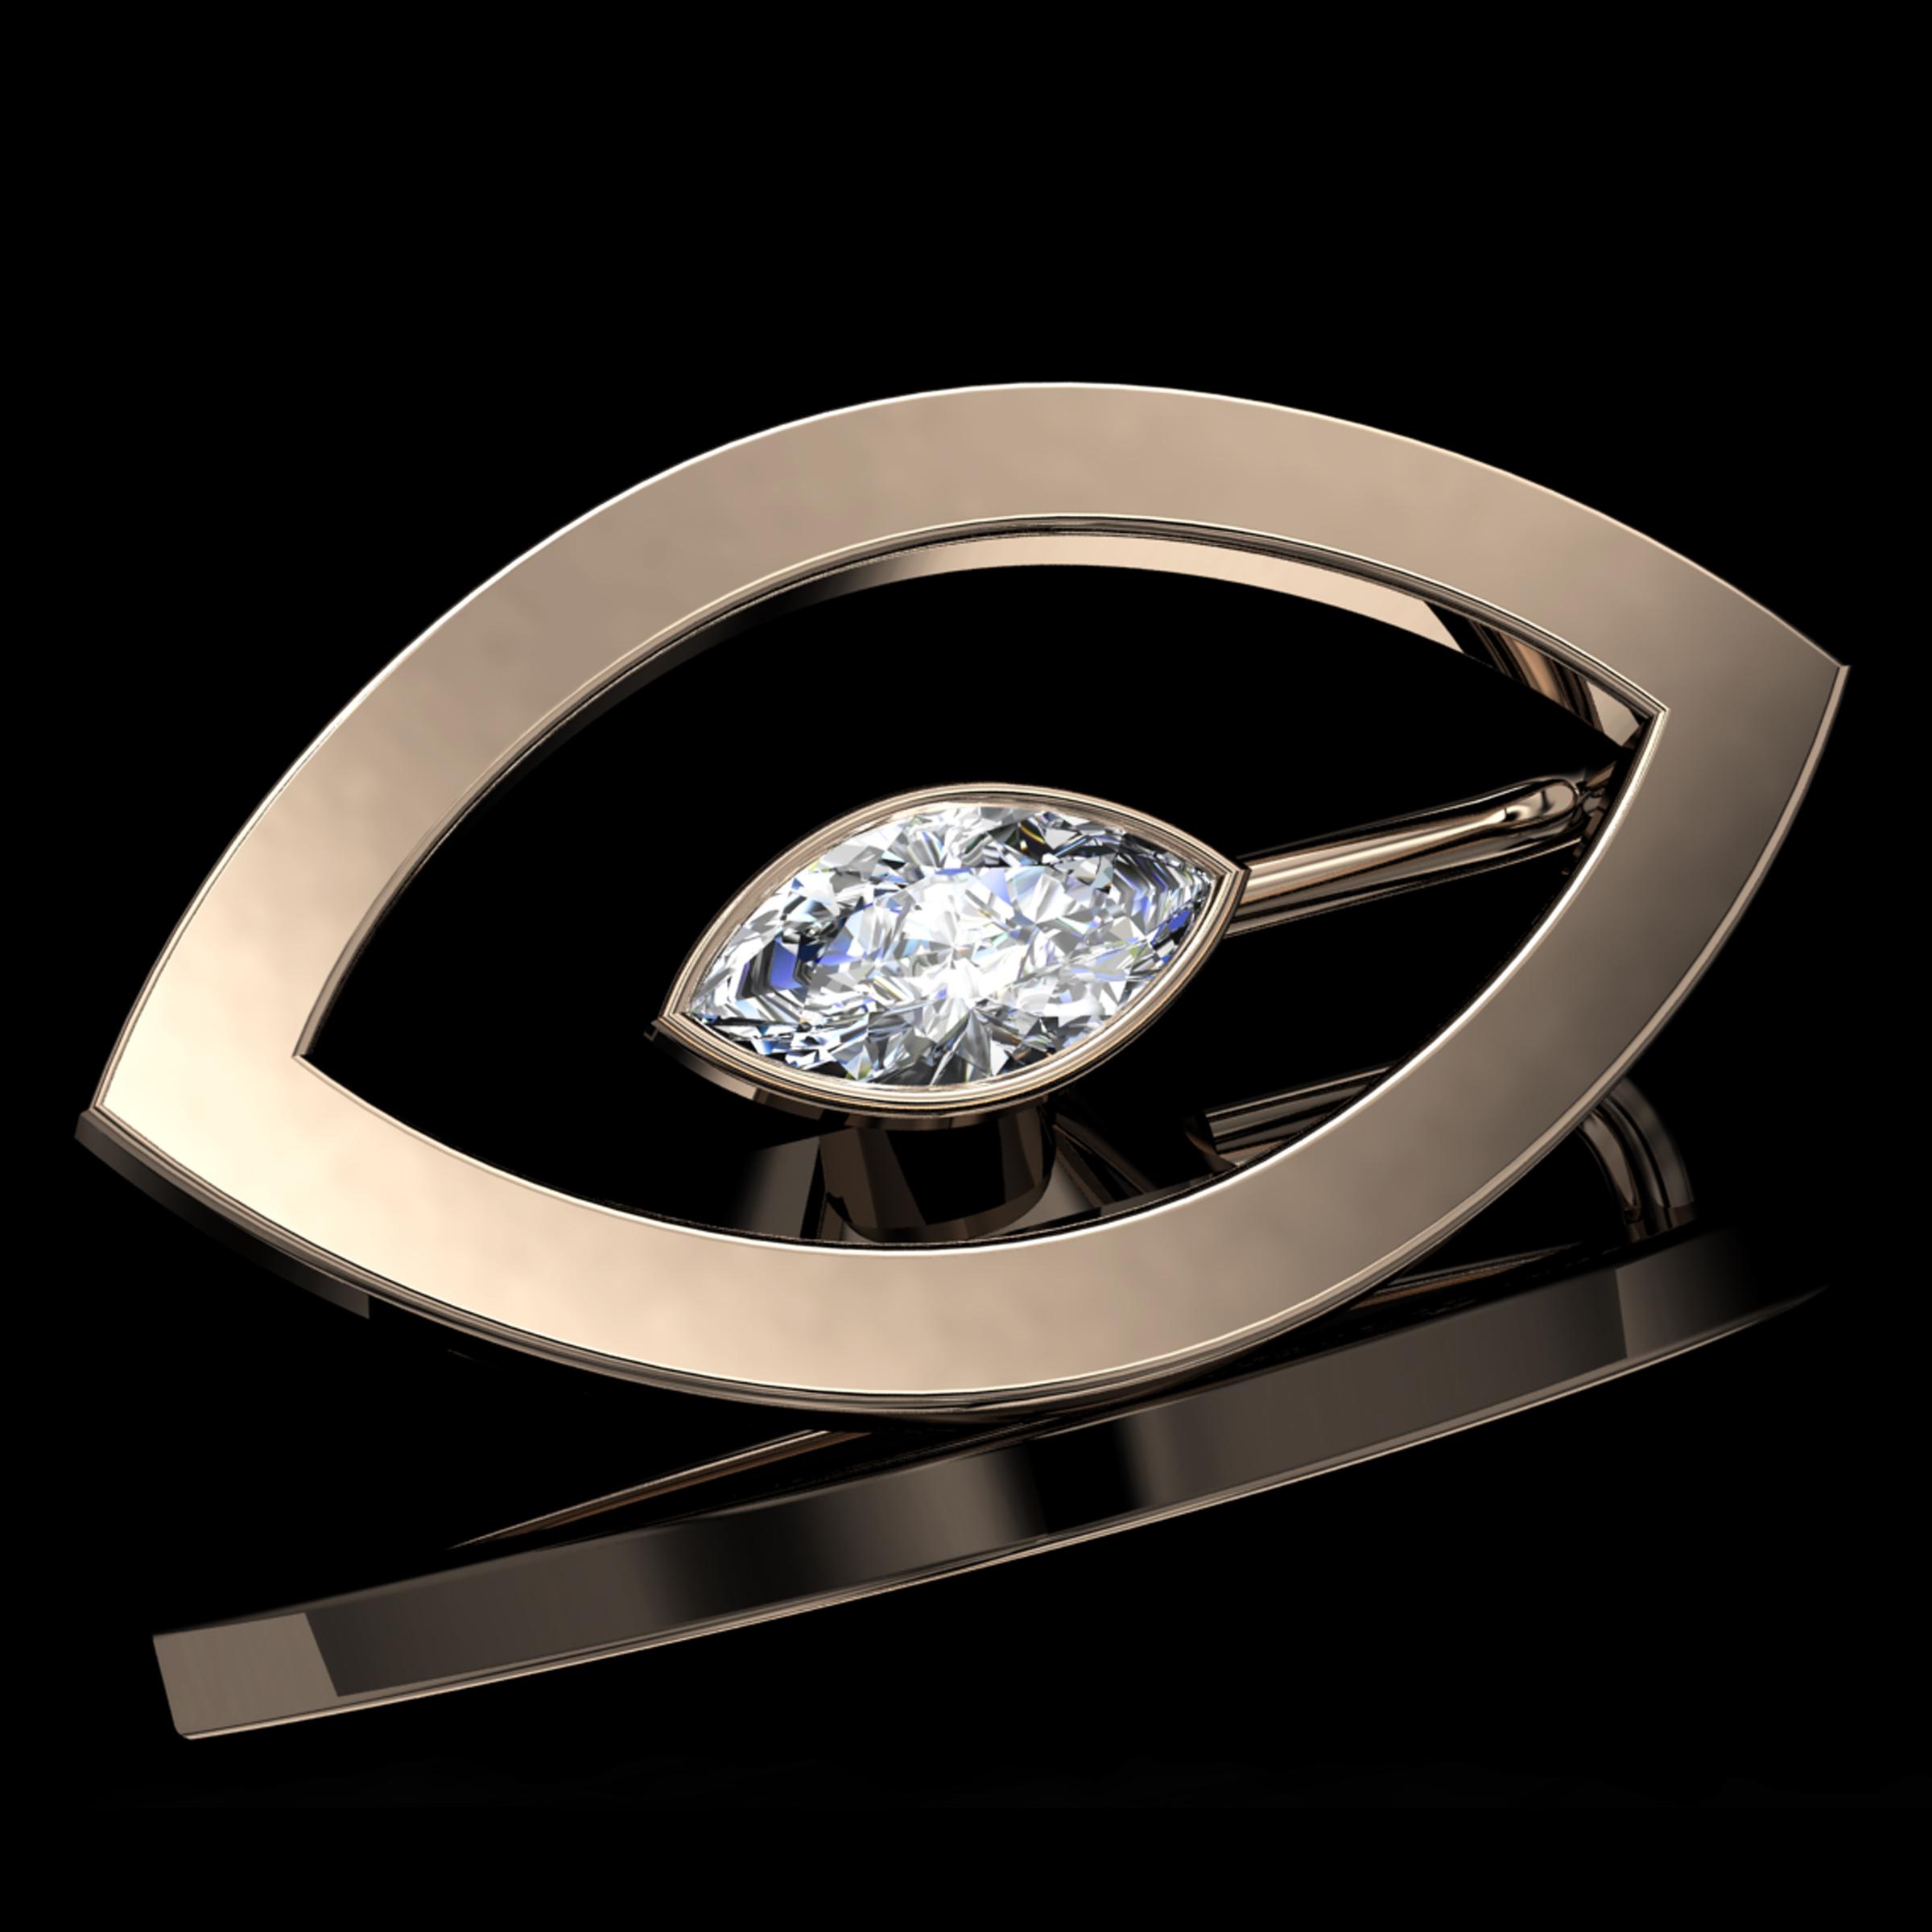 'ETERNO MARQ'®  Natural Marquise-Cut Diamond • 0.55 Carats • F / VVS2 (G.I.A) • 18K Rose Gold